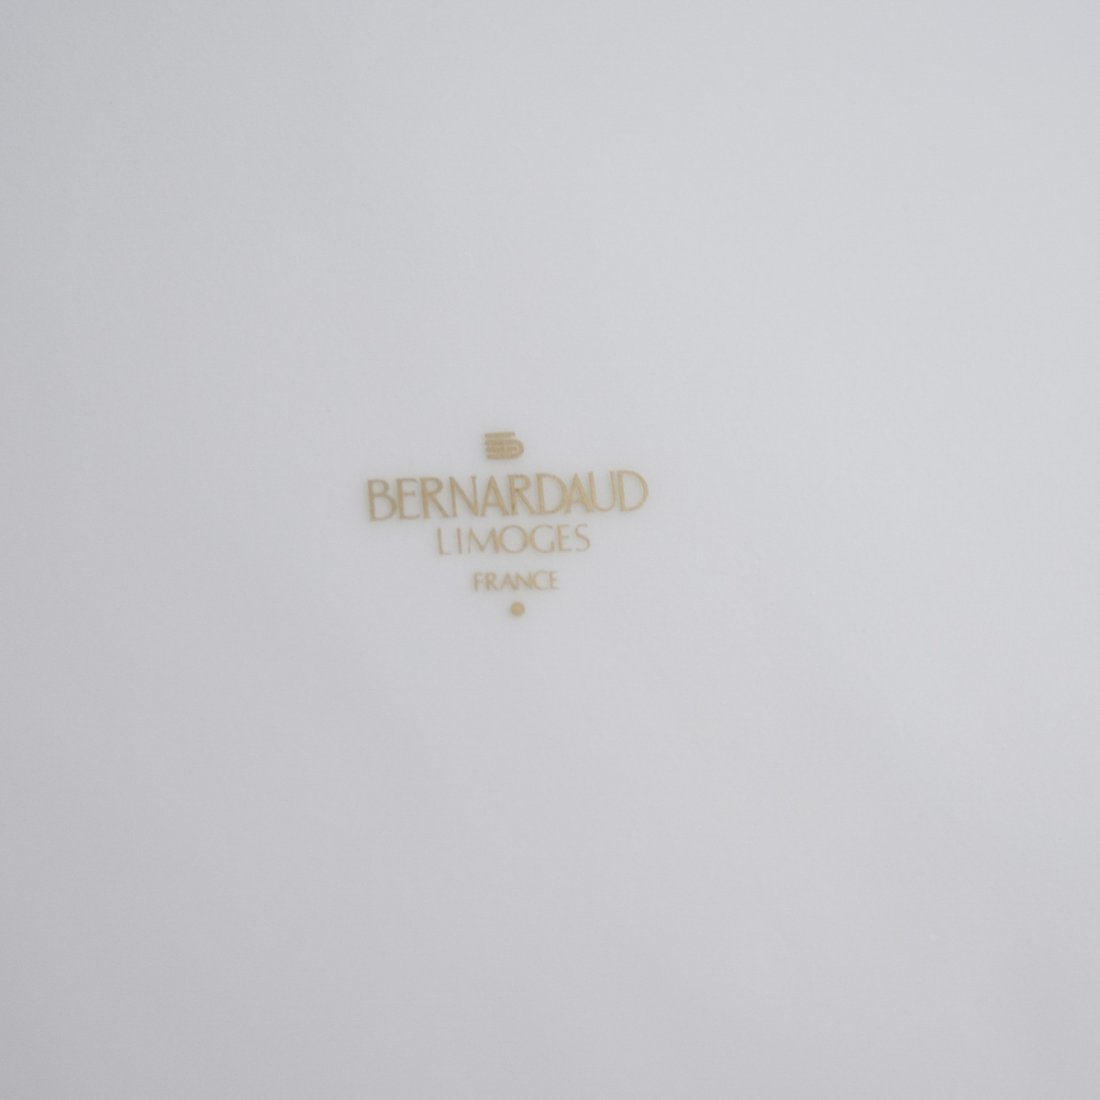 Bernardaud Limoges Porcelain Dinner Plates - 3